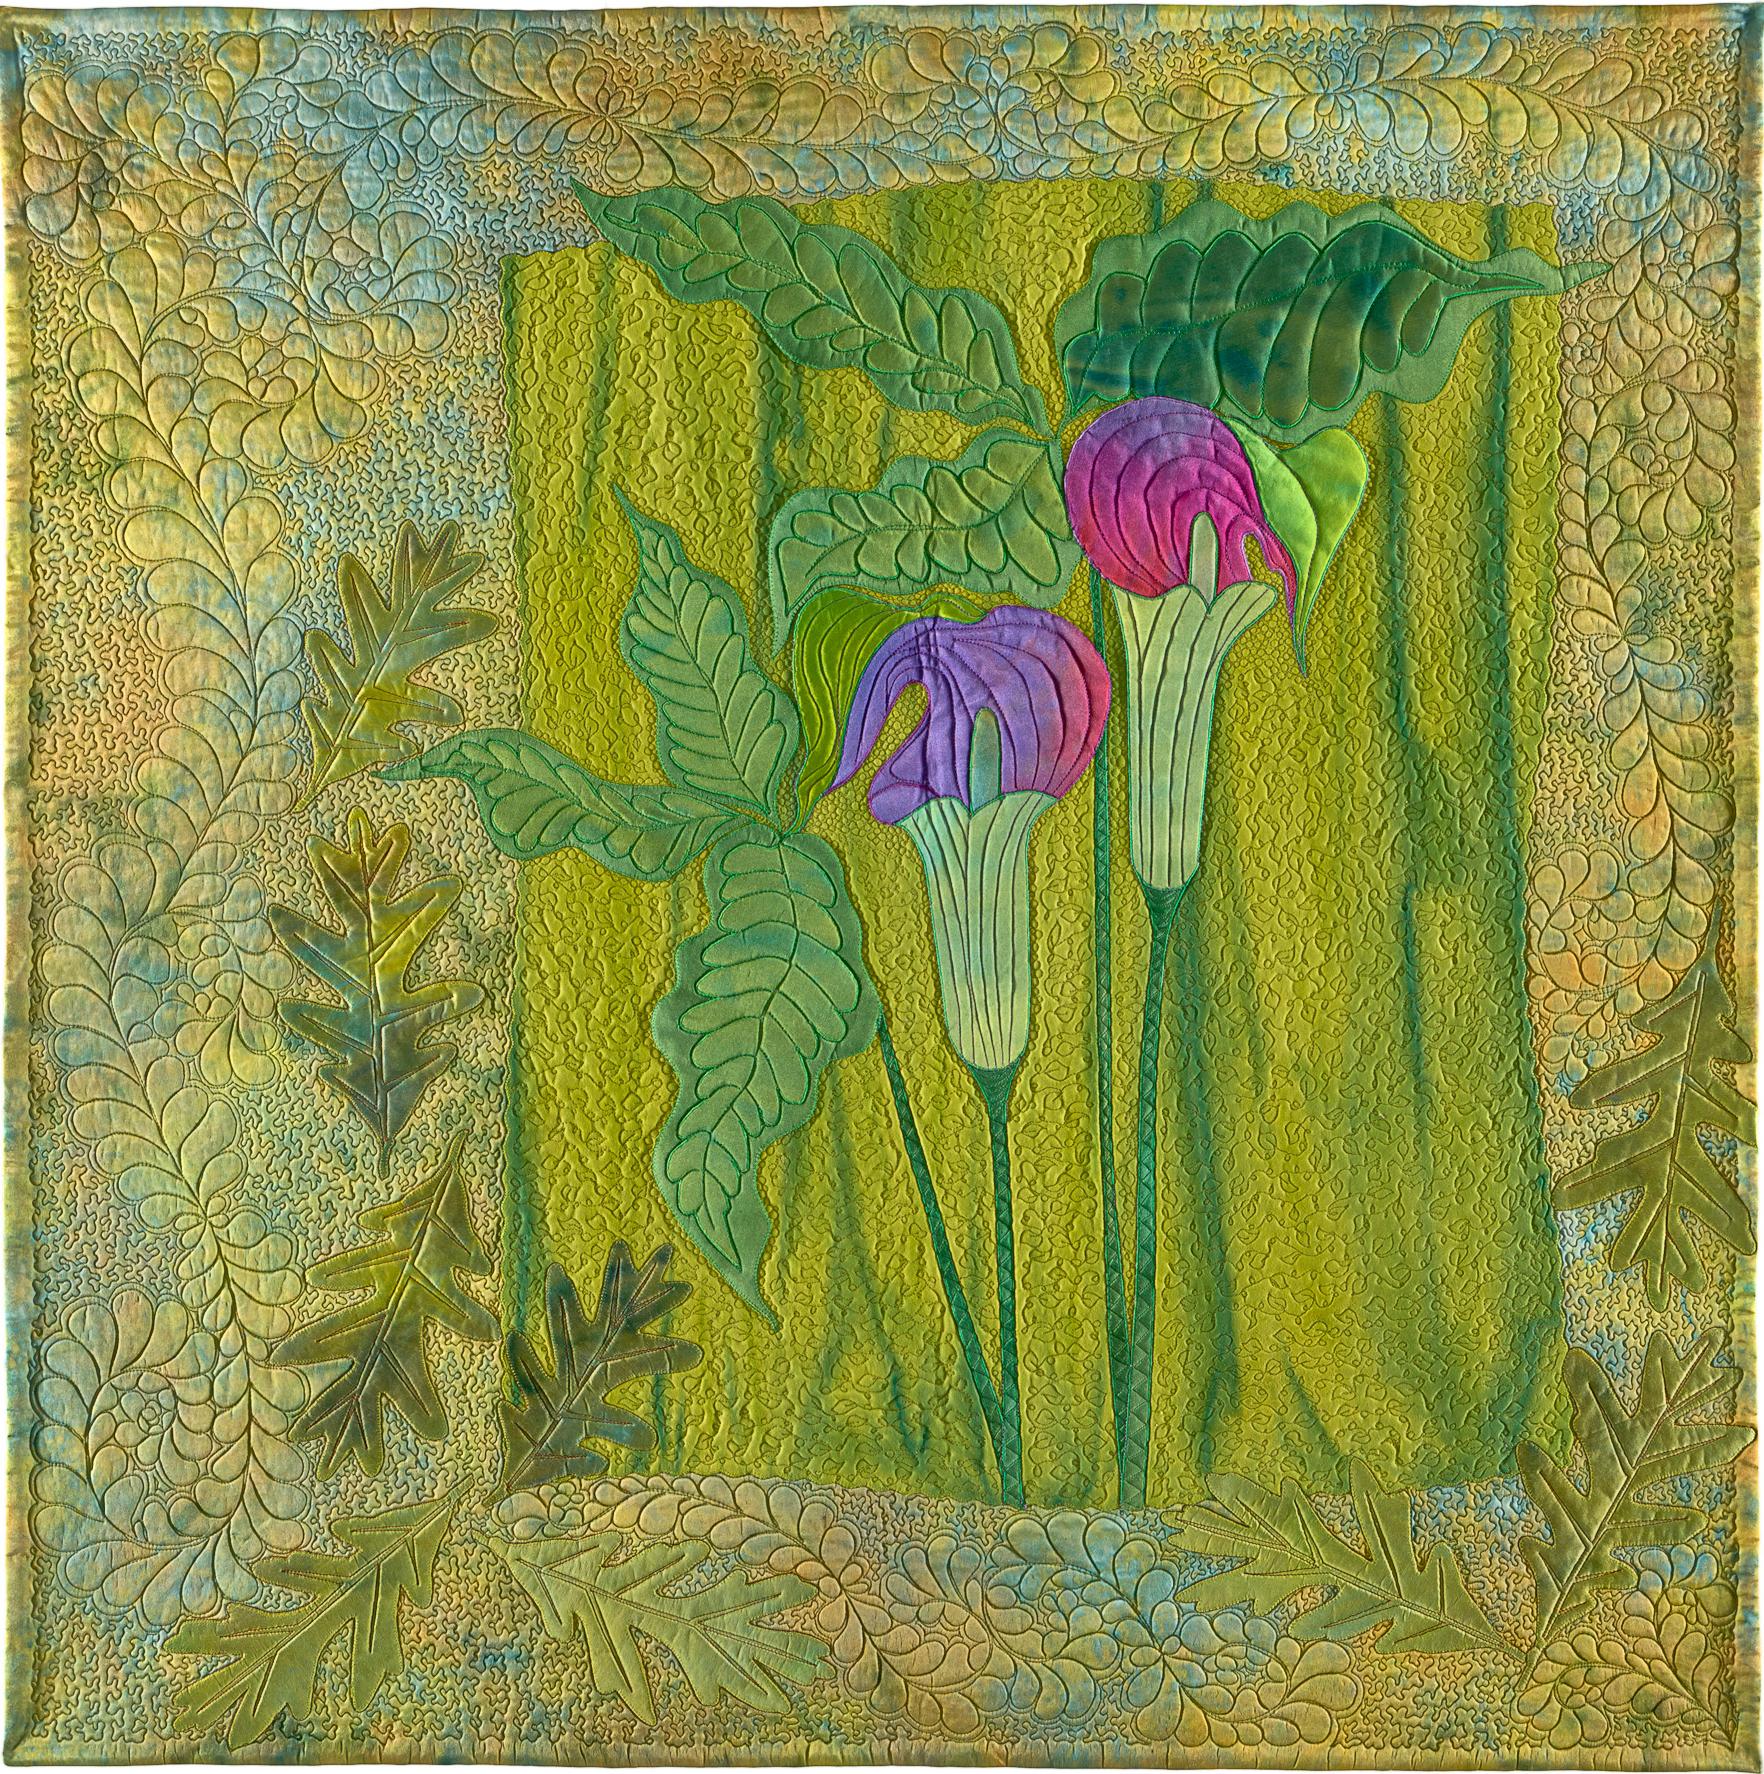 Frieda Anderson's quilt Woodland Secrets